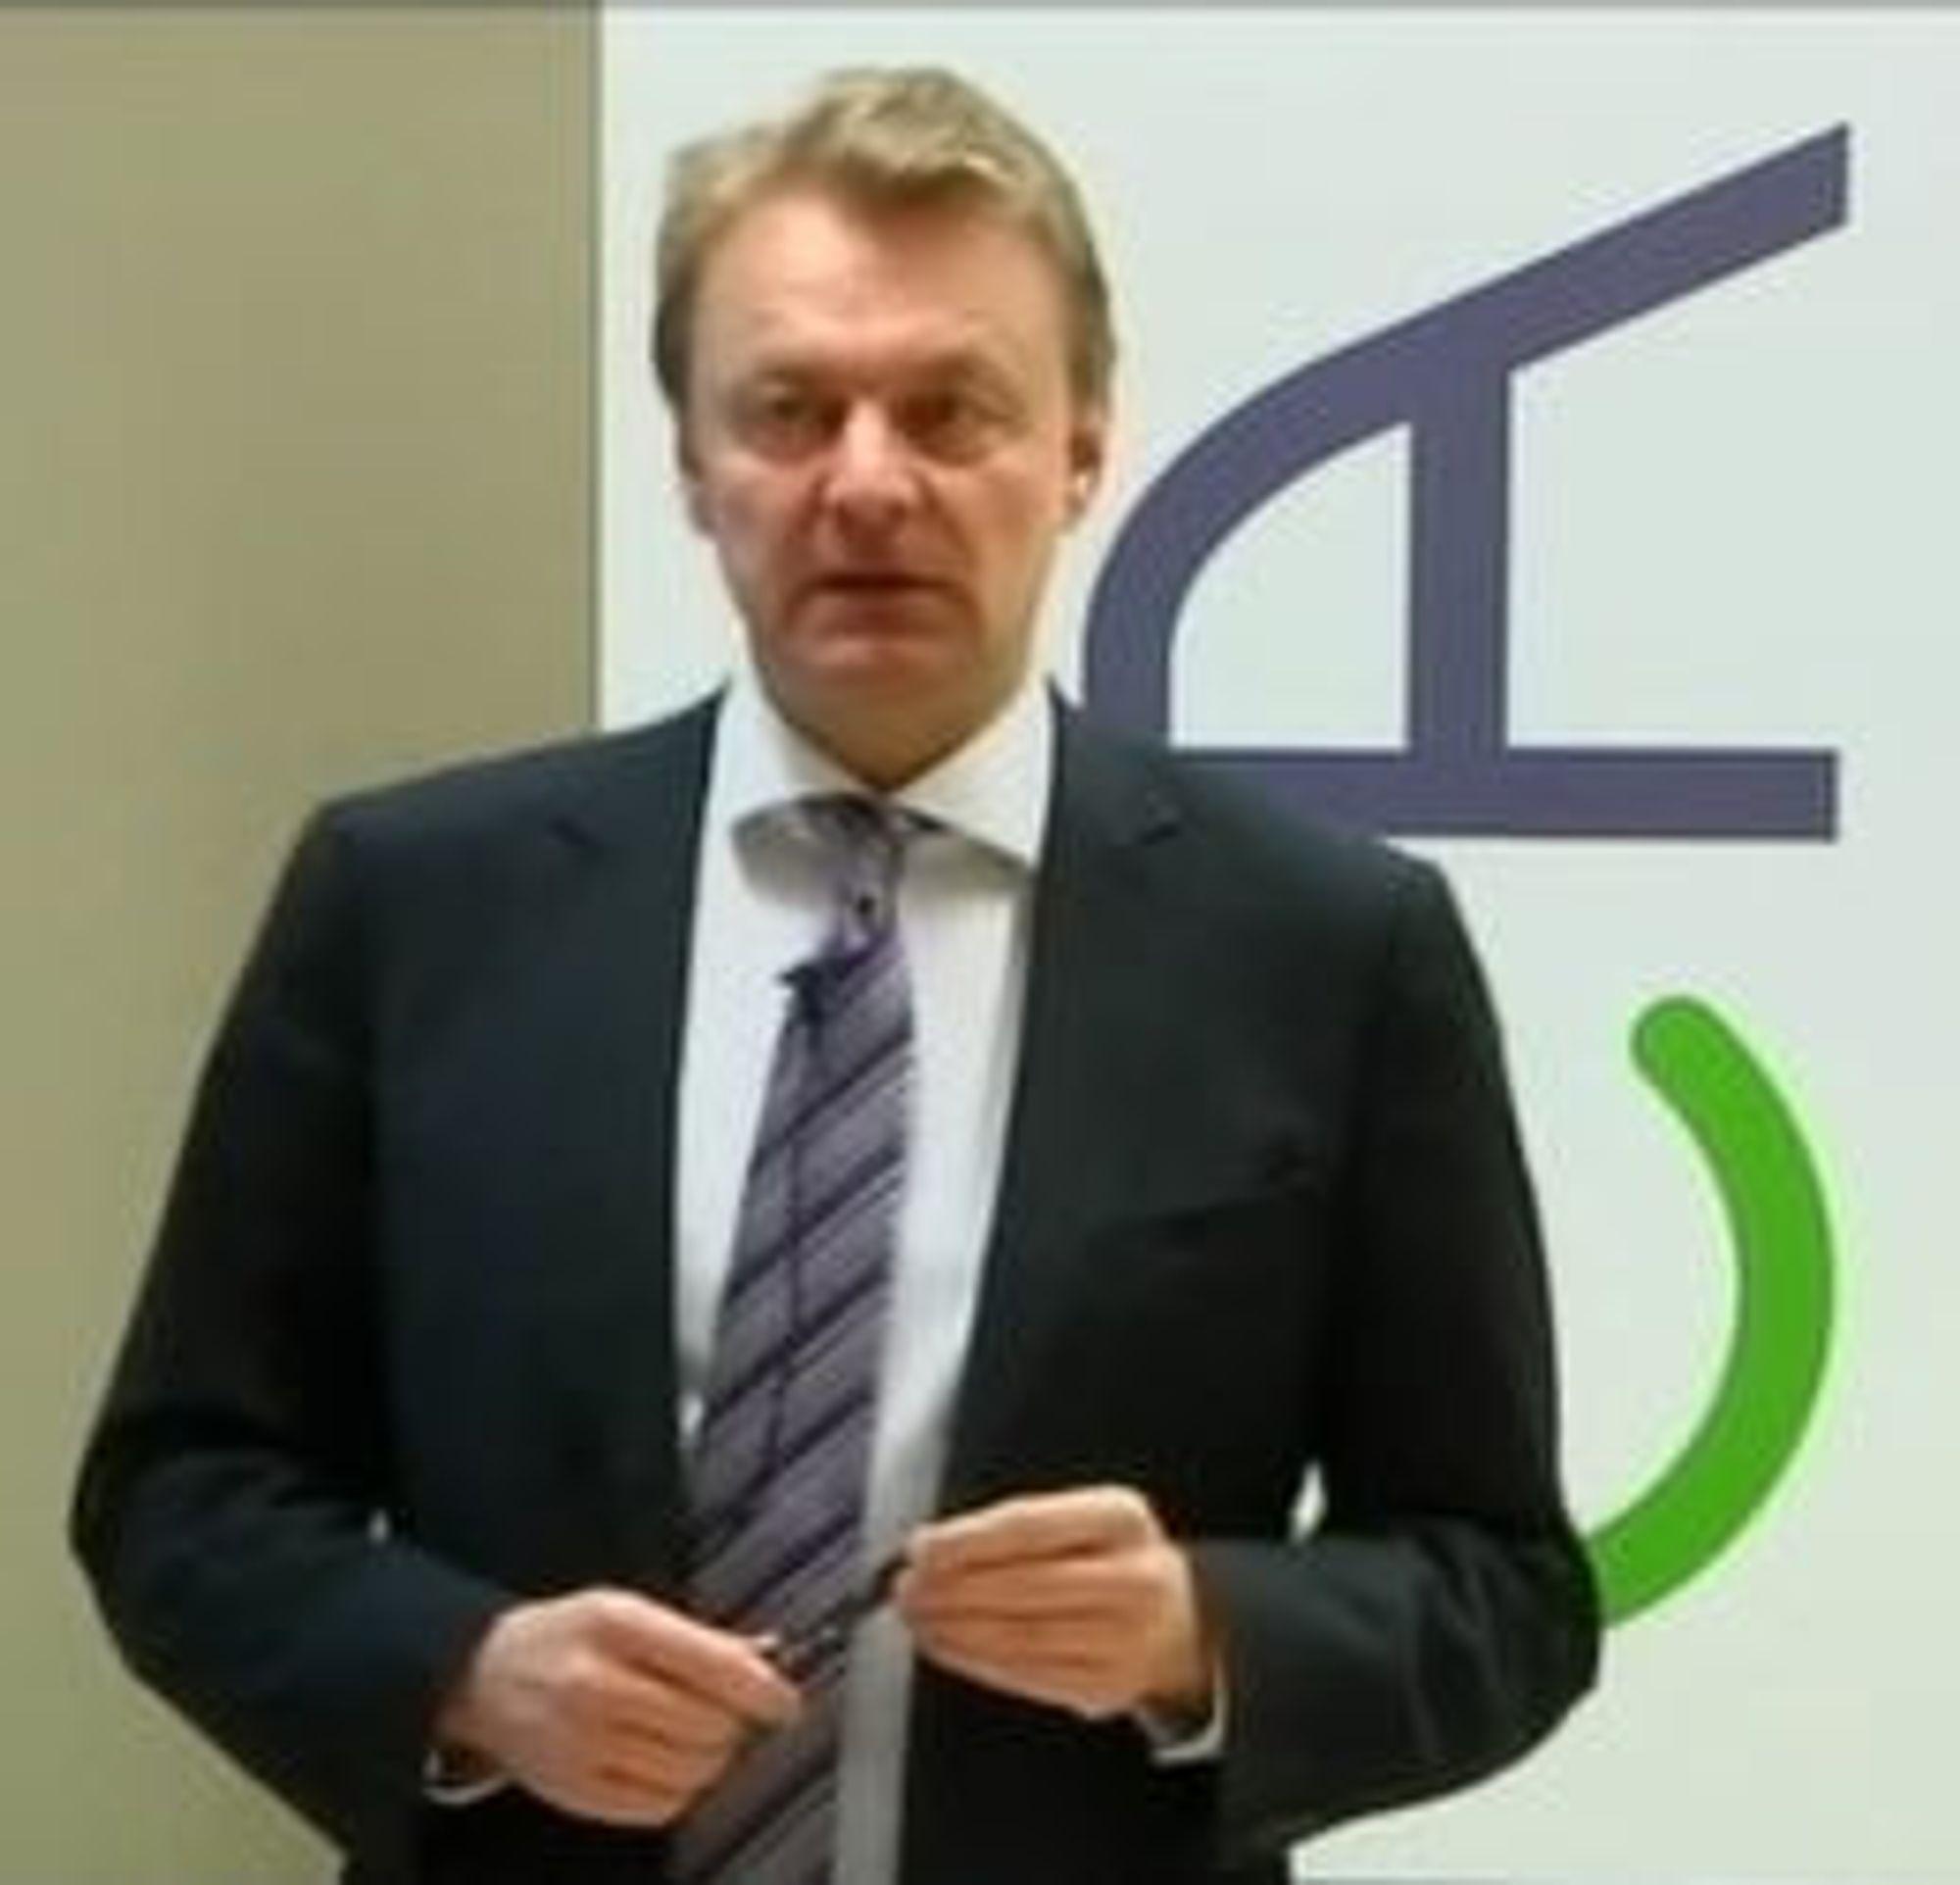 Konsernsjef Claus Hougensen er skuffet over Ateas utvikling i Norge.